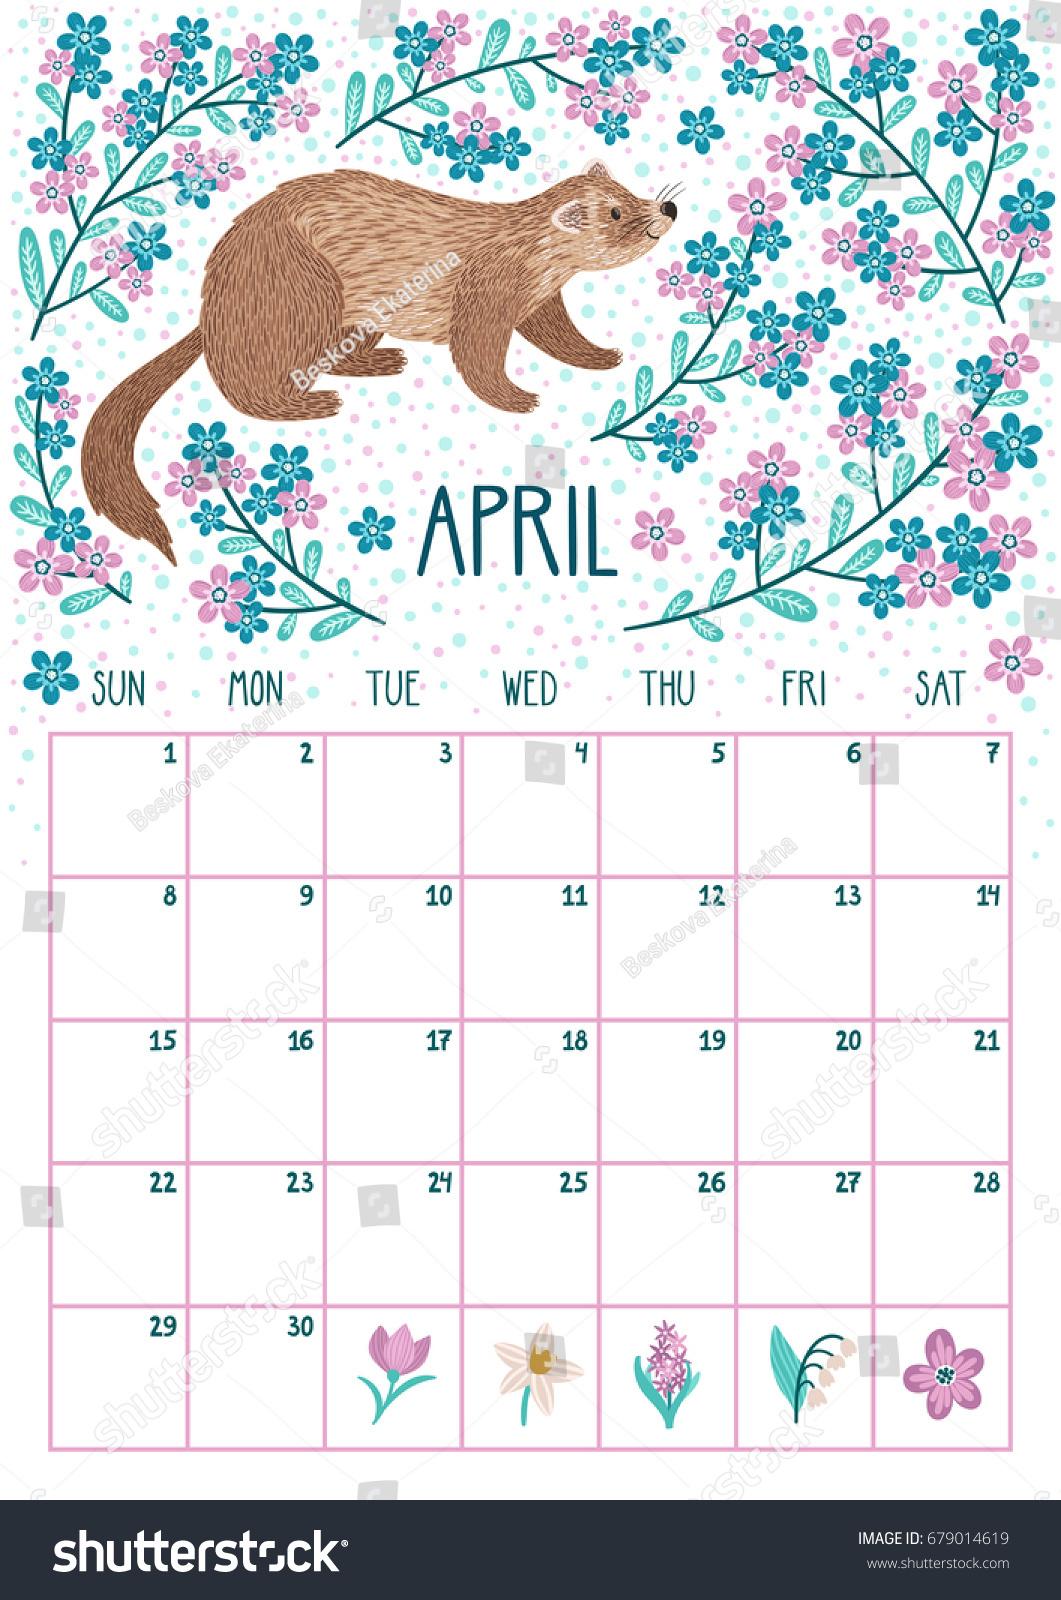 April Calendar 2018 April Calendar 2018April Calendar 2018